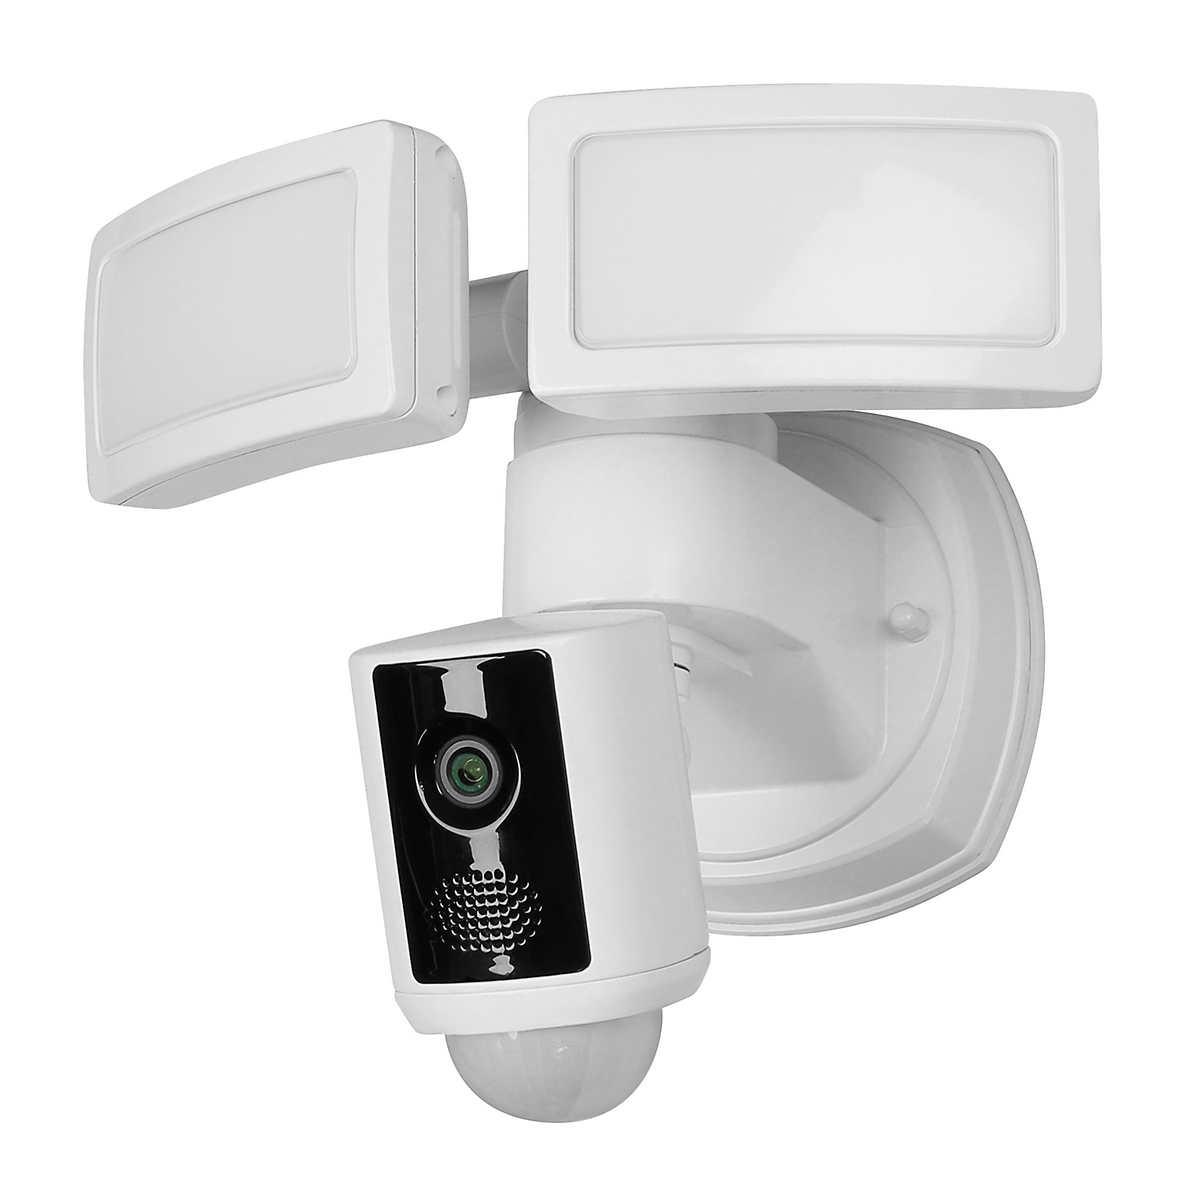 Motion Sensor Detector w// Light /& Voice Alarm for Backyard Guard /& Home Security